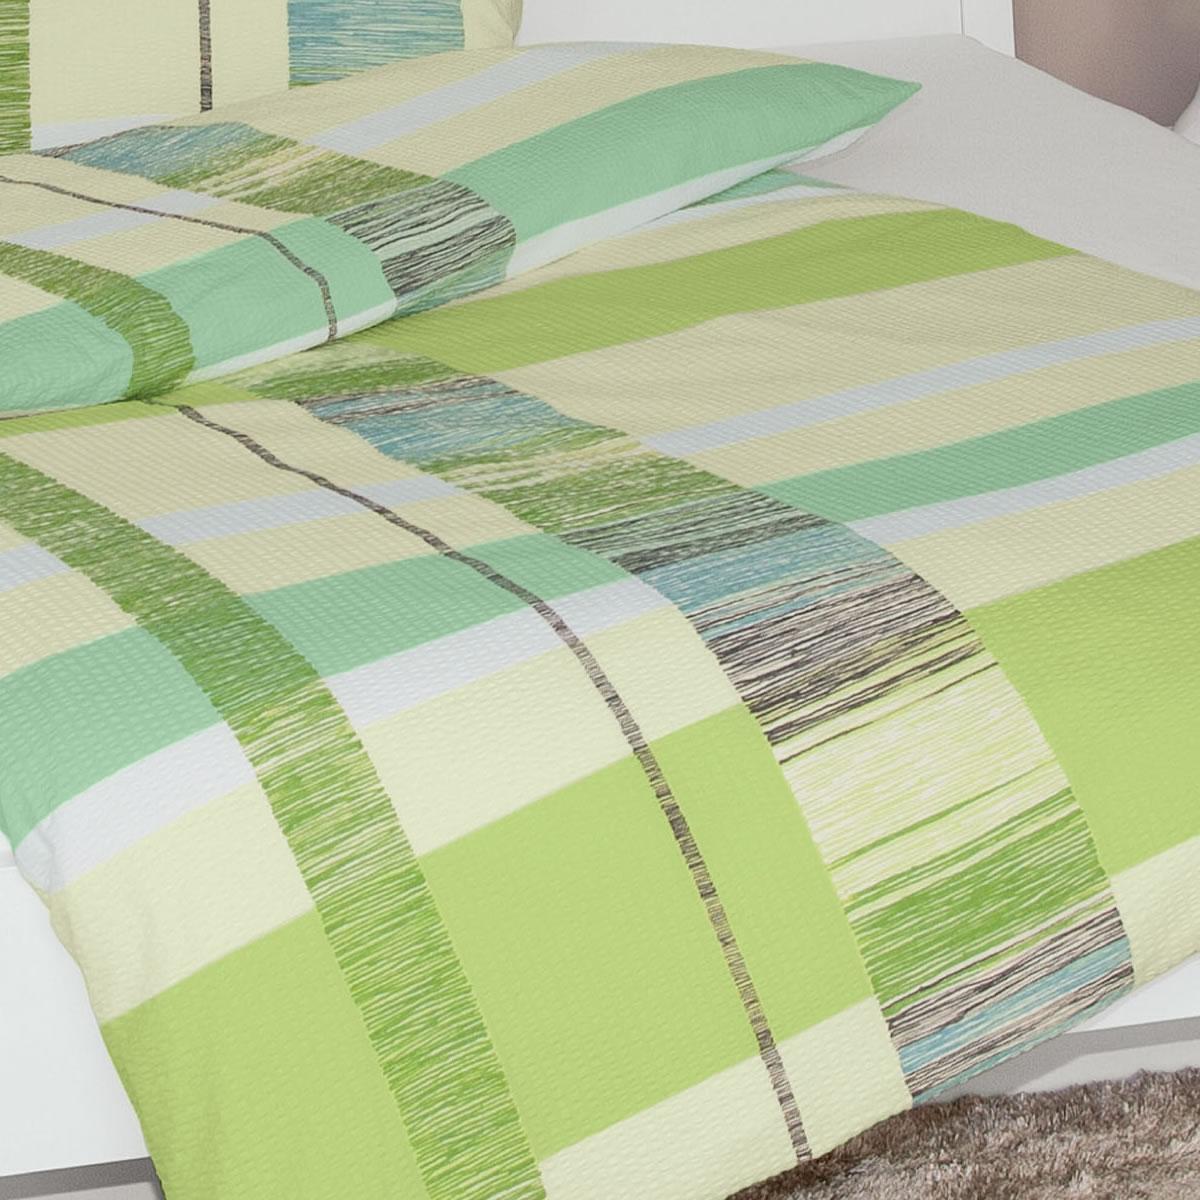 janine mako soft seersucker bettw sche tango design 2377 06 gr n kariert. Black Bedroom Furniture Sets. Home Design Ideas